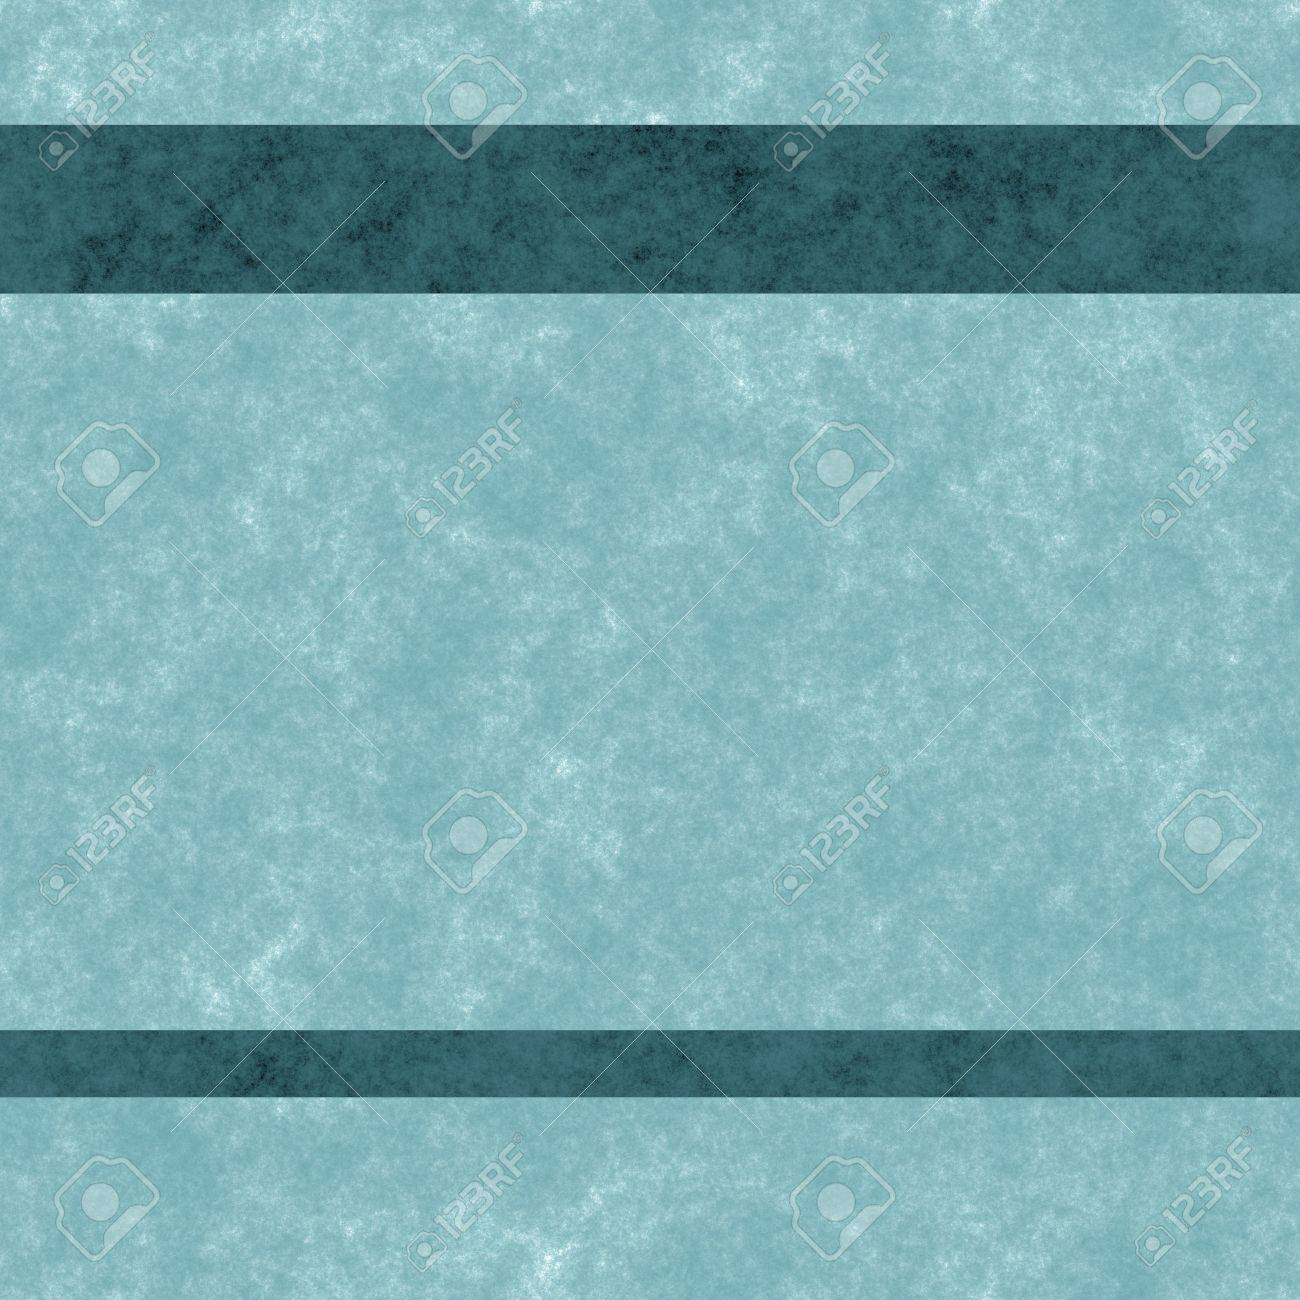 blue bold grunge stripes background, tiles seamless as a pattern Stock Photo - 4014997